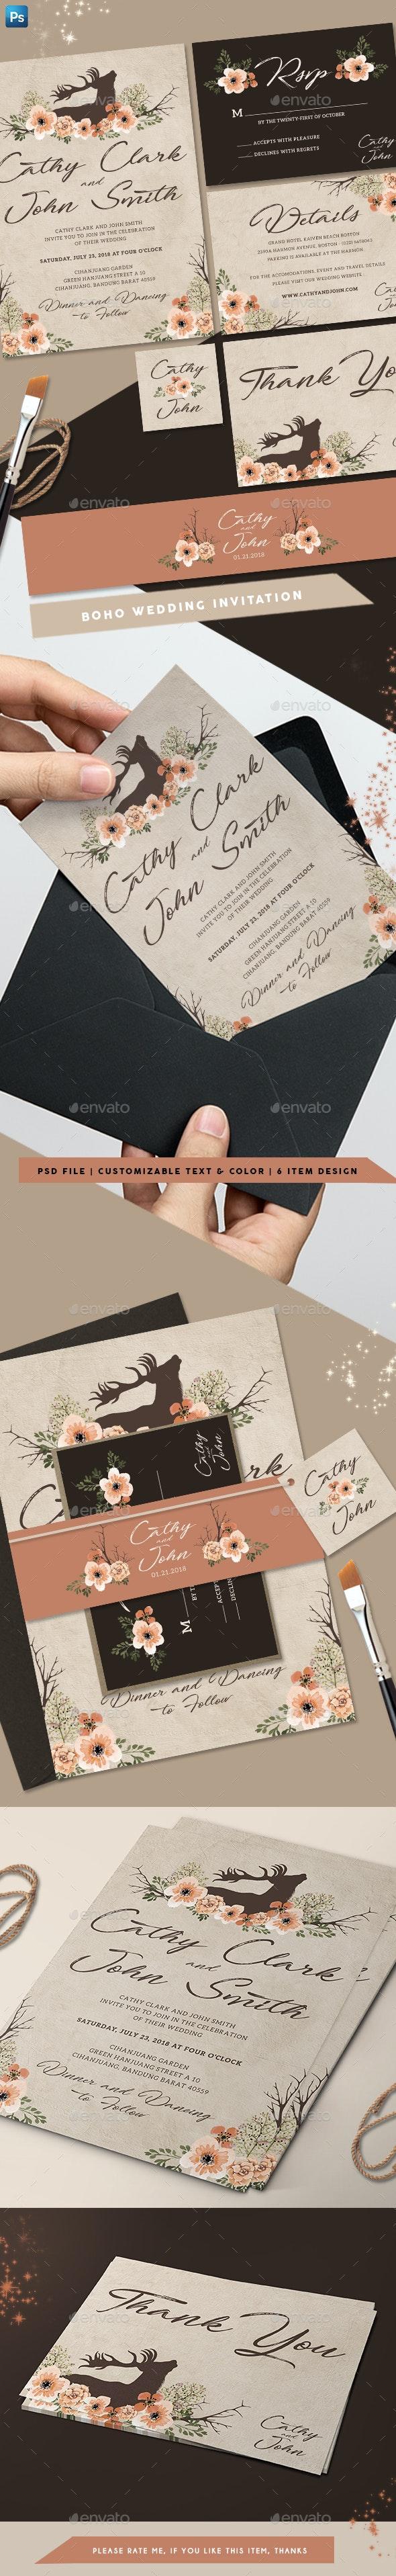 Boho Wedding Invitation - Weddings Cards & Invites